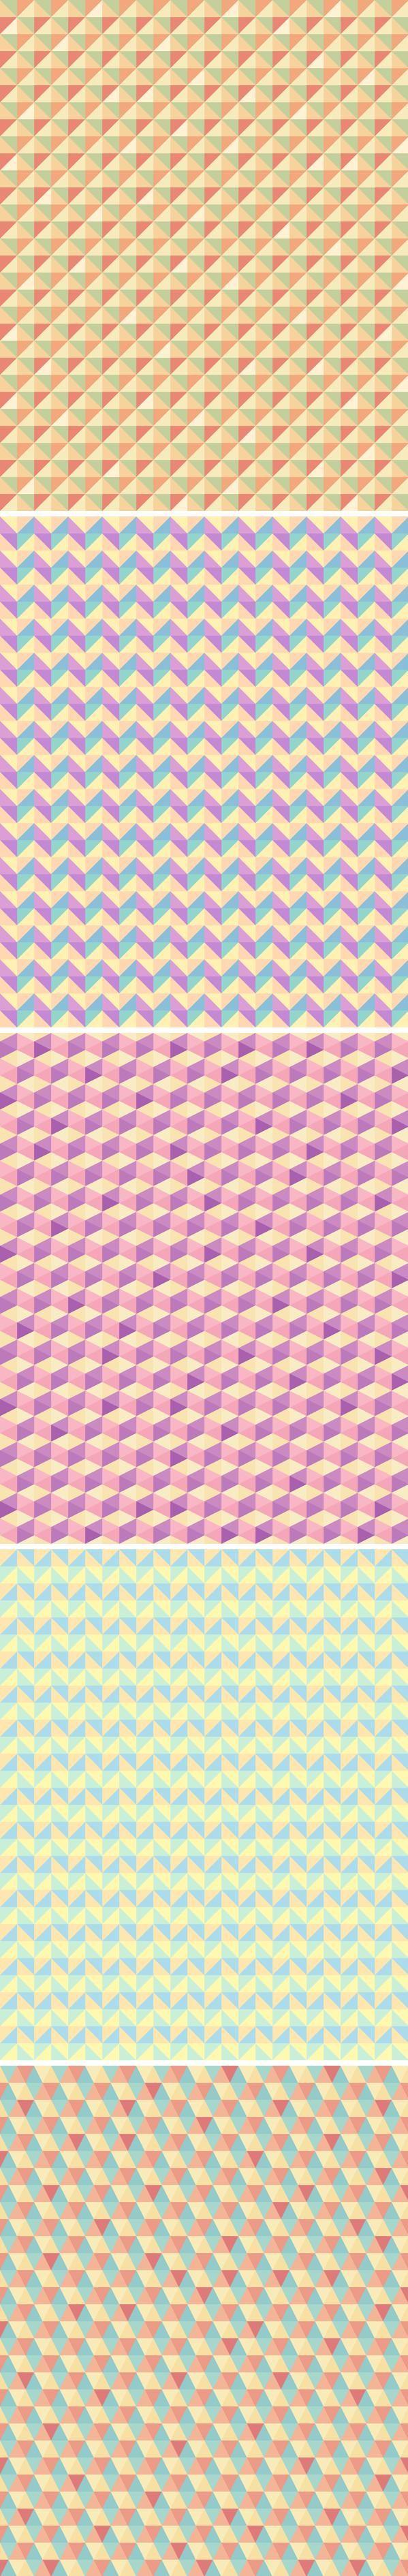 5 Seamless Polygon Backgrounds бесплатно на seedraft.ru